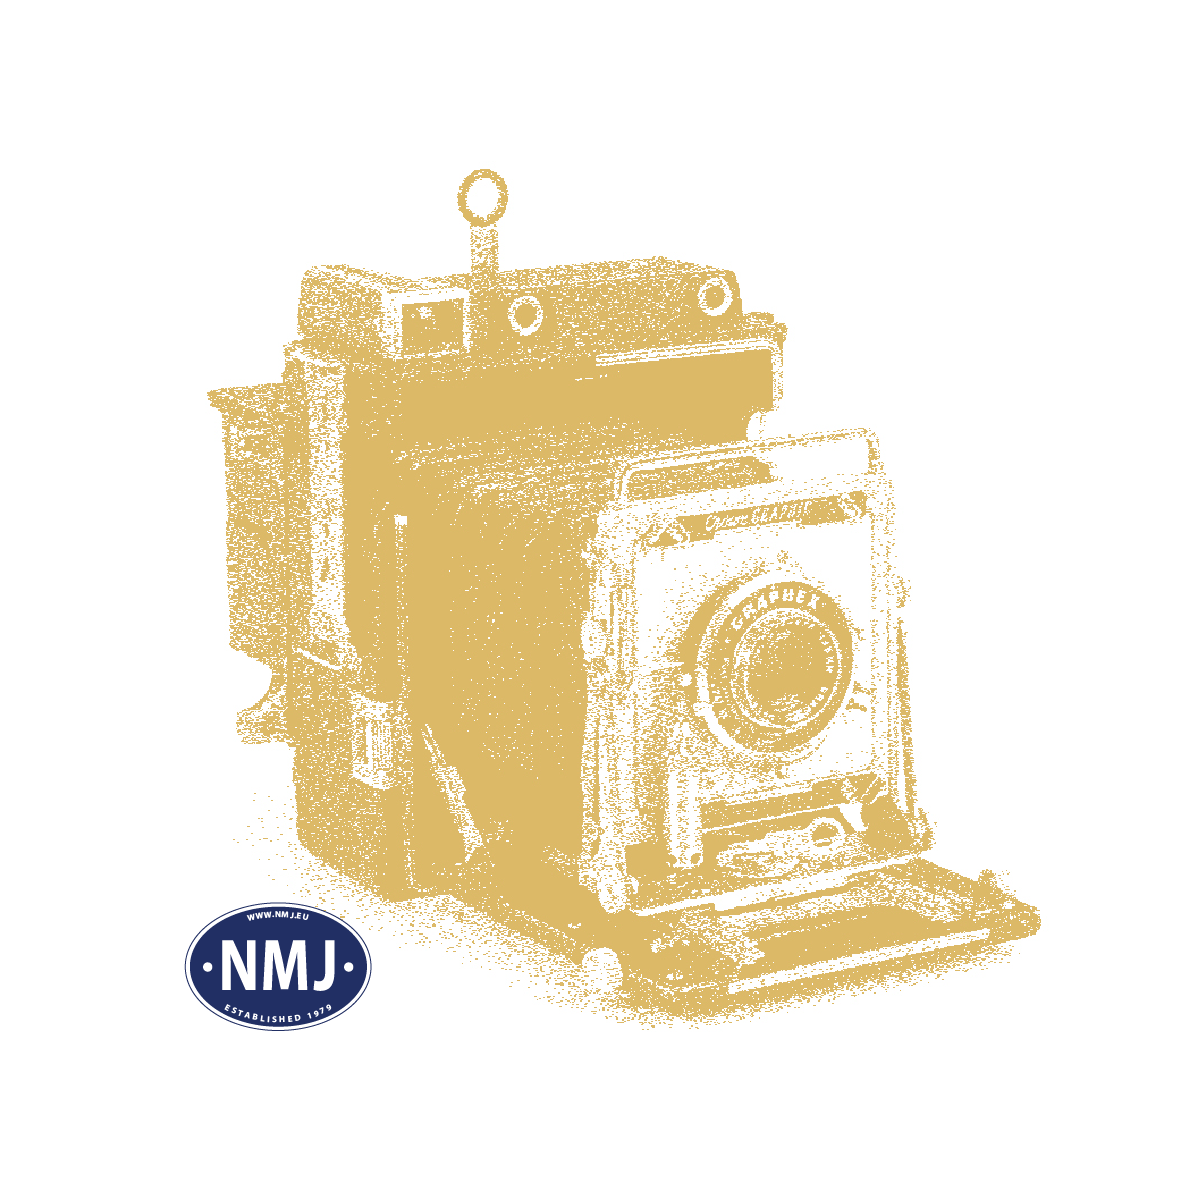 WODFS623 - Lysegrønt Statisk Gress, 7mm, 42g